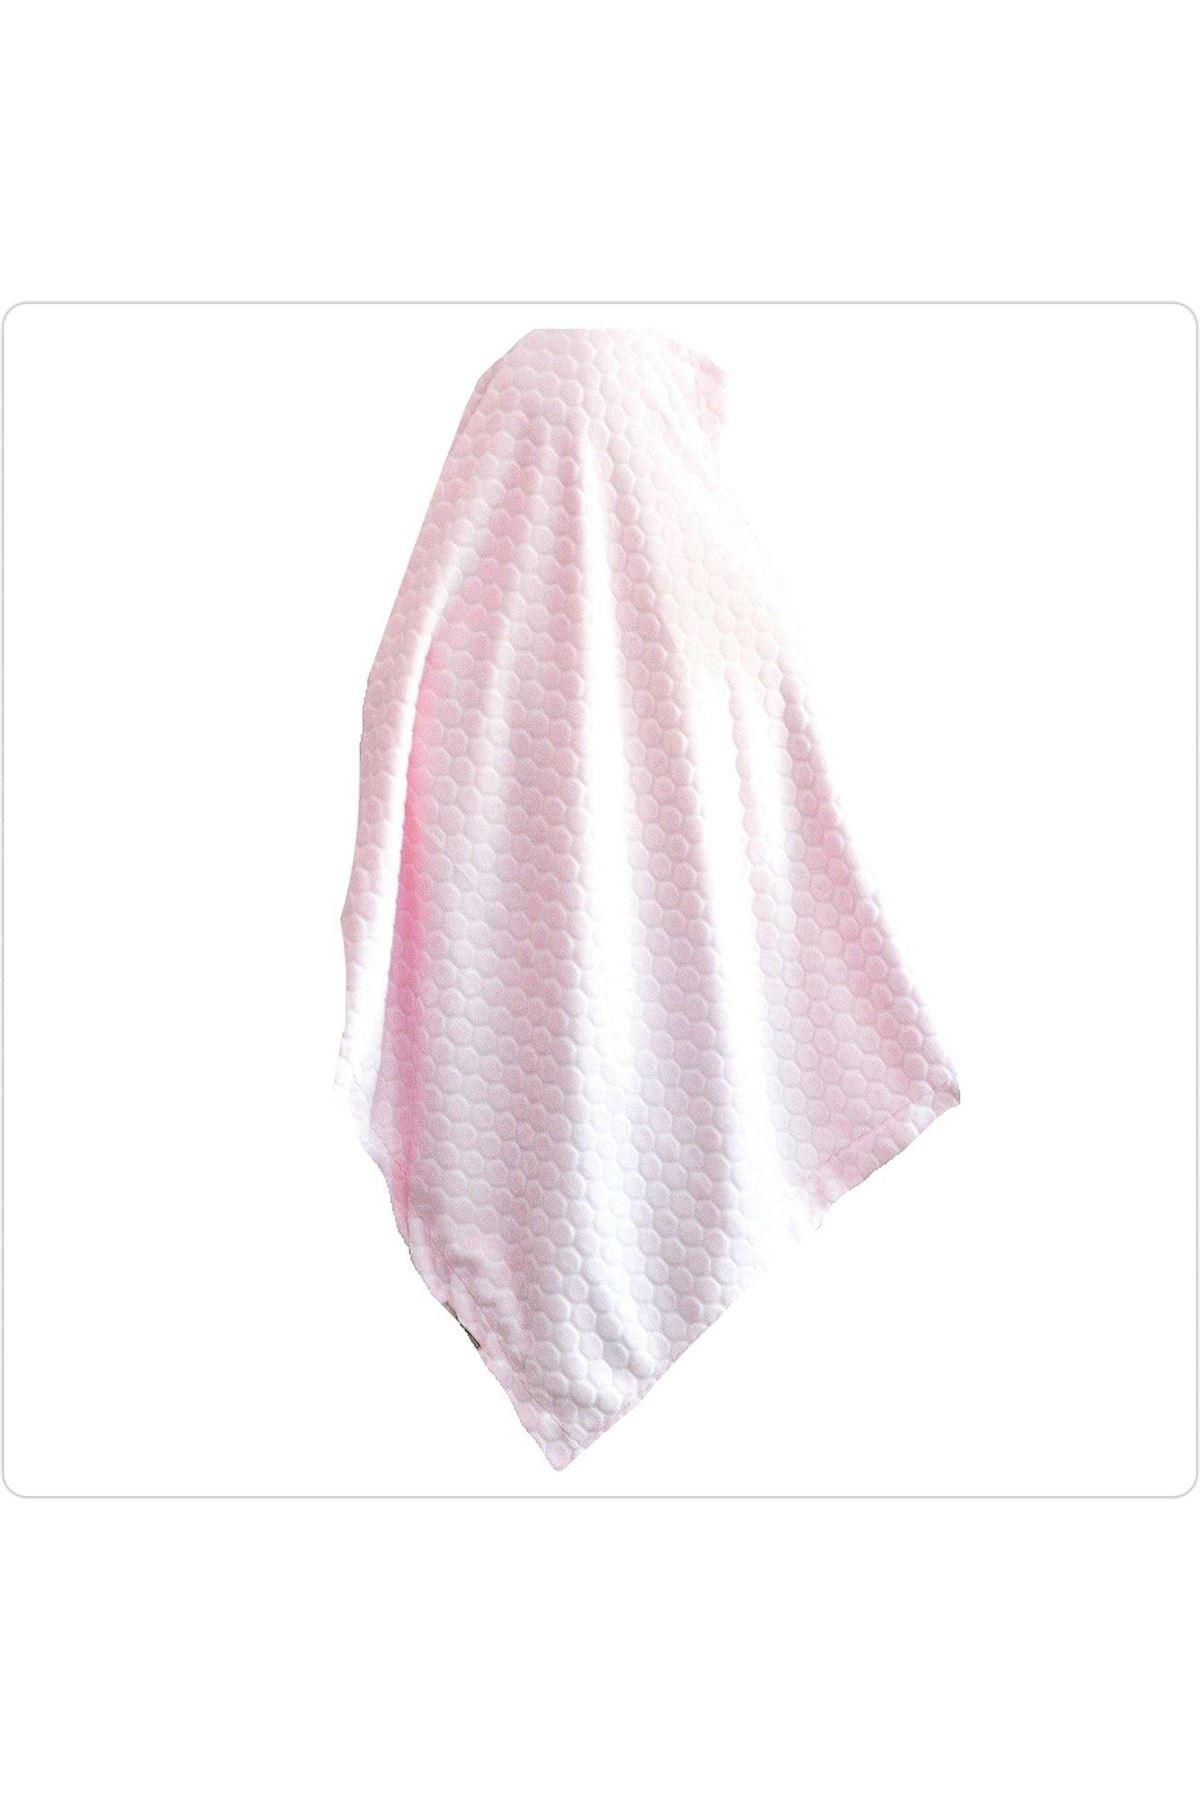 Bebitof Baby Kabartmalı Velboa Bebe Battaniye 95024 Pembe